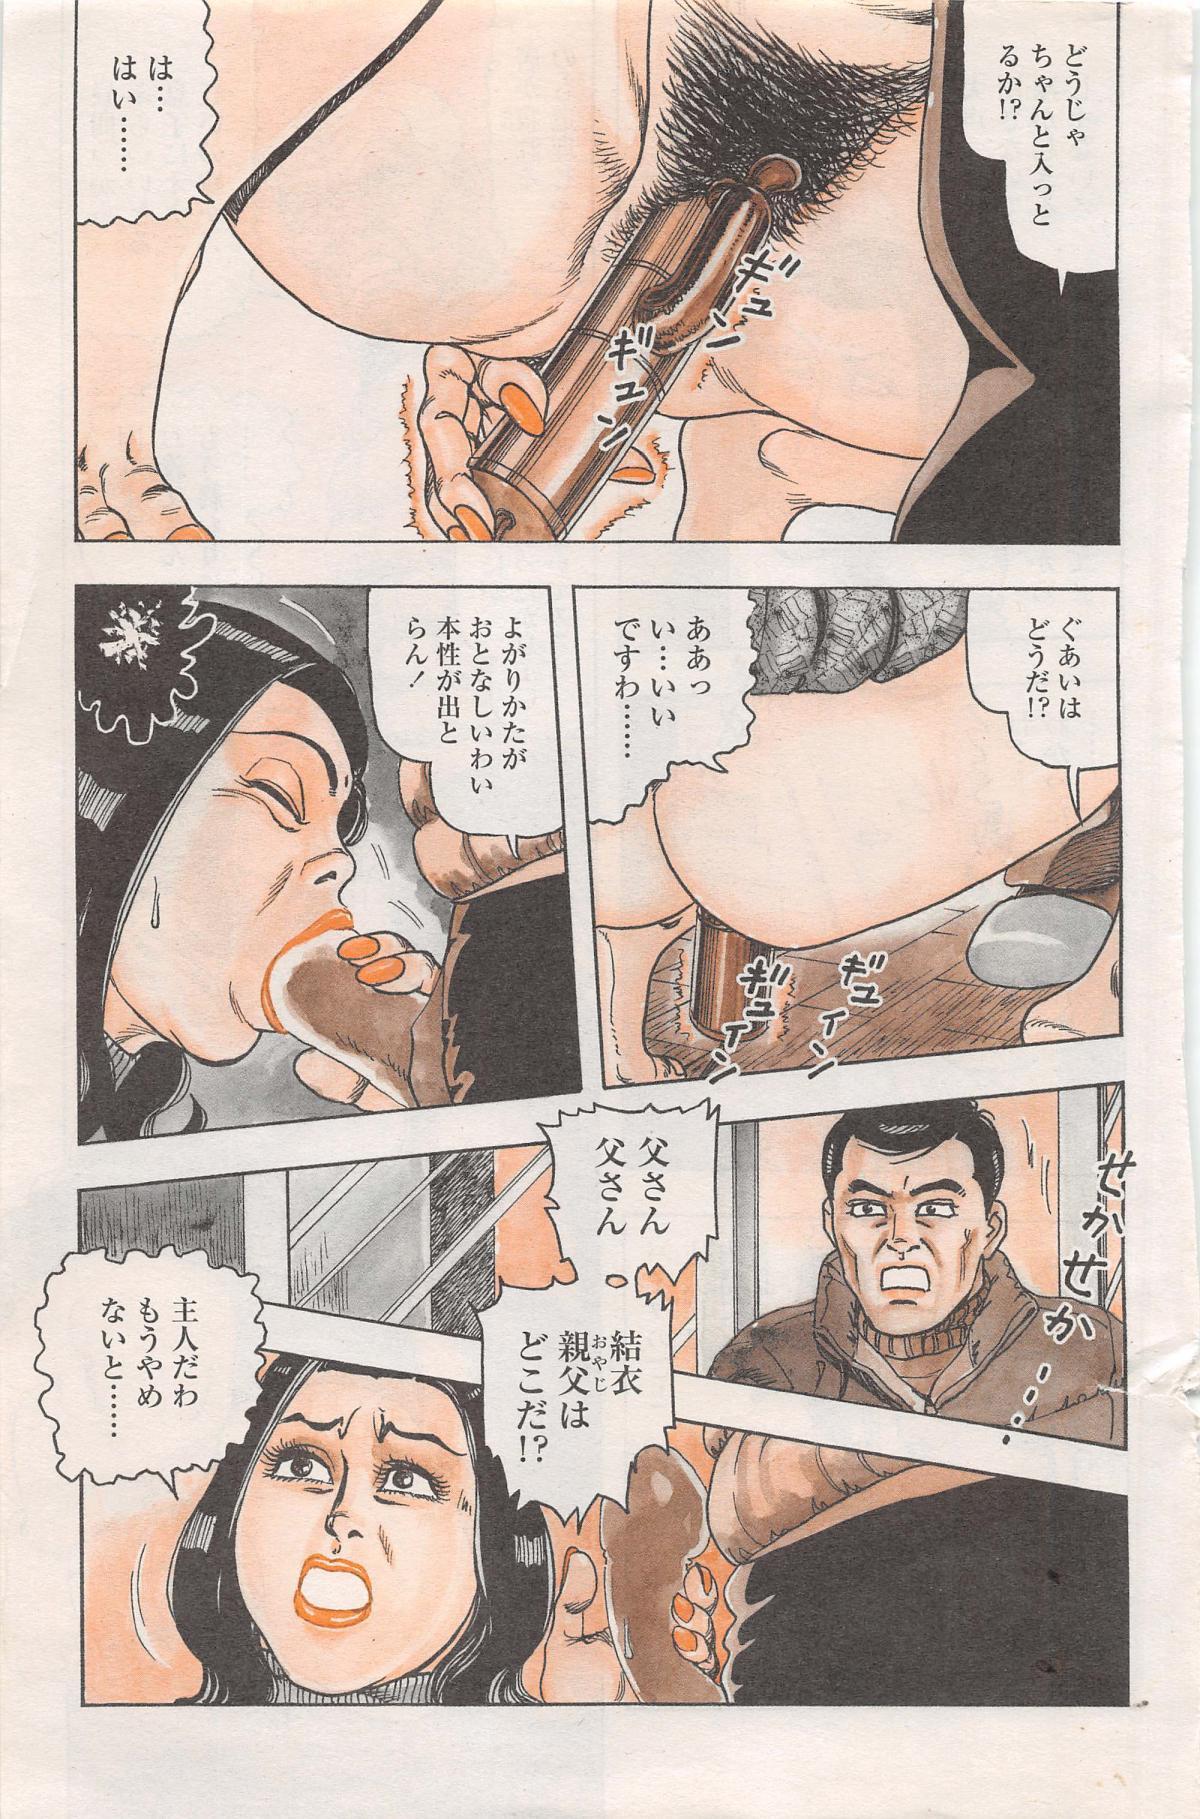 Manga Lawrence 2013-04 88